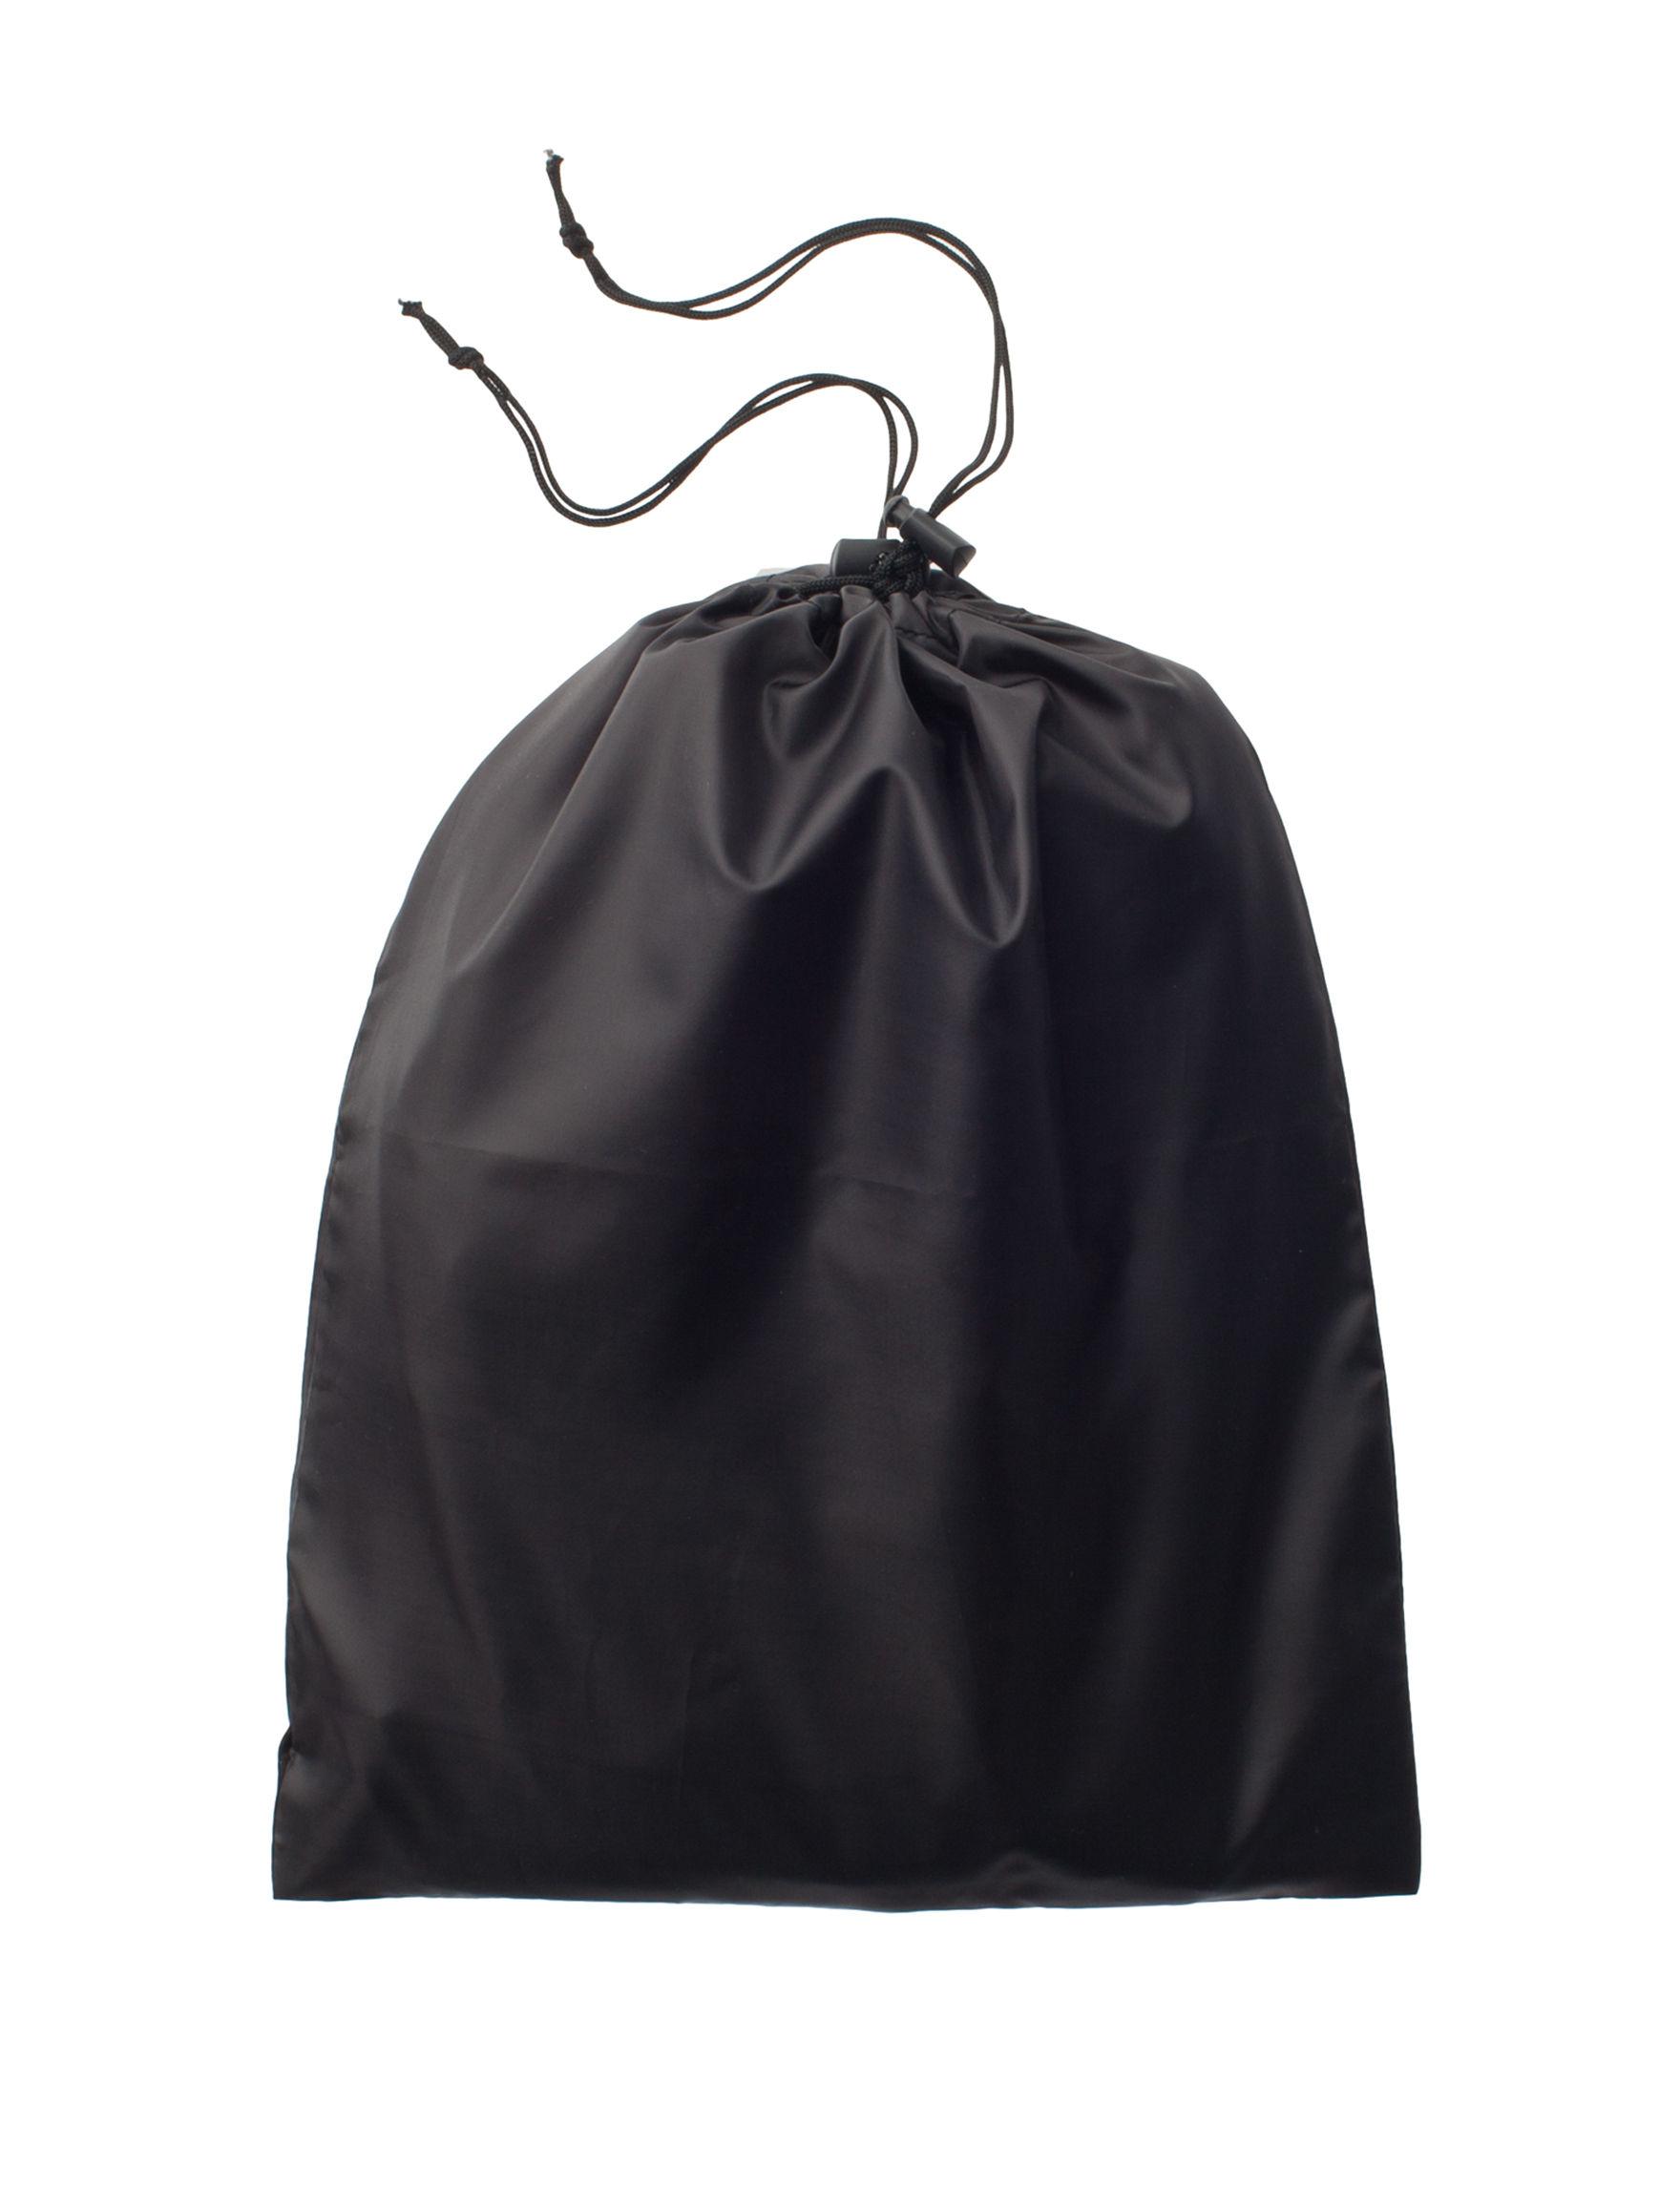 Travelers Club Luggage Black Travel Accessories